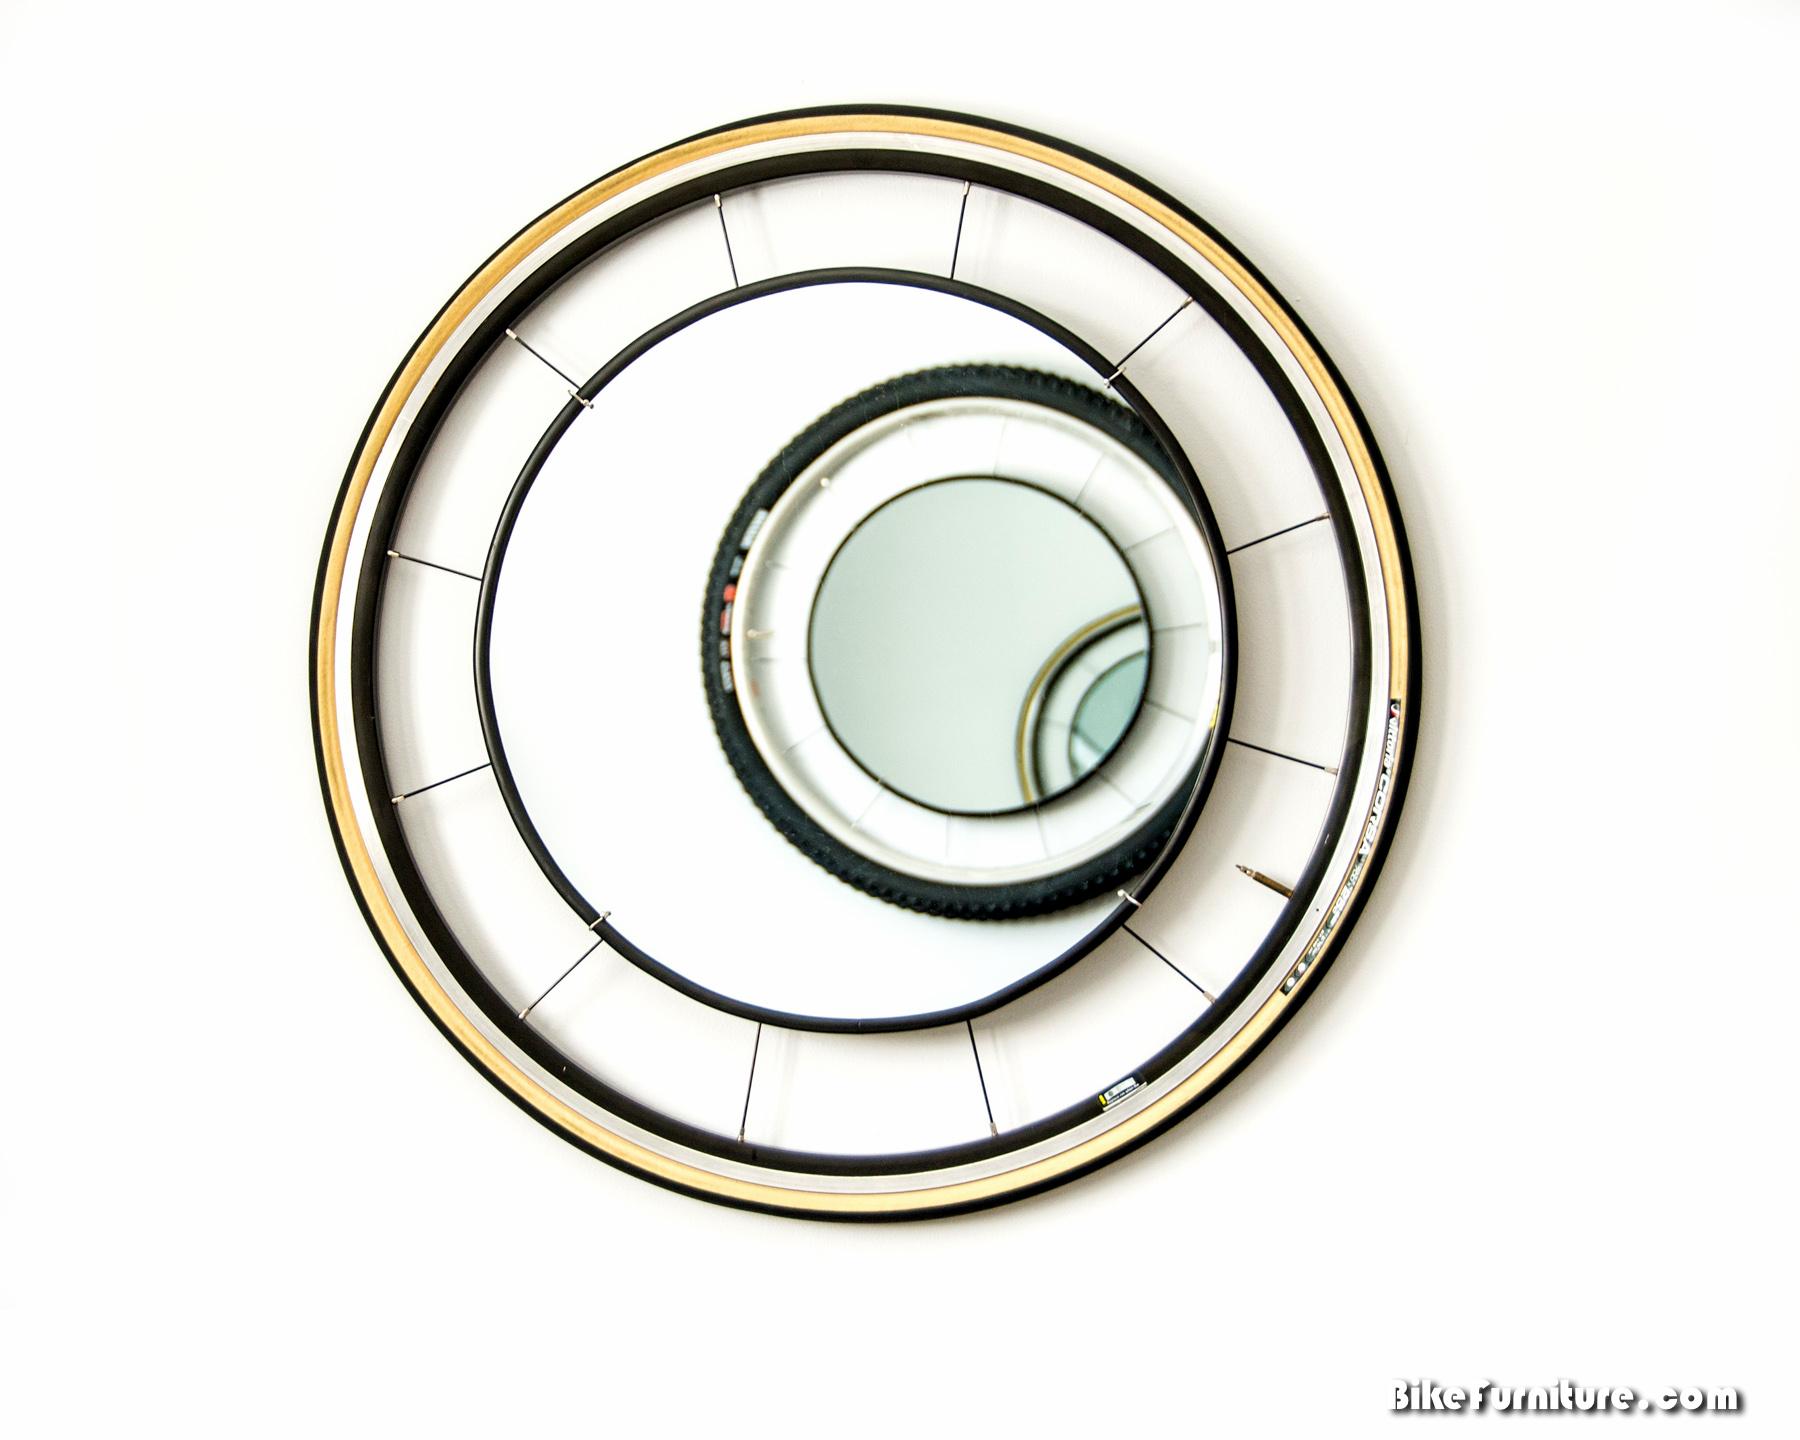 mirrors29-700-8507.jpg